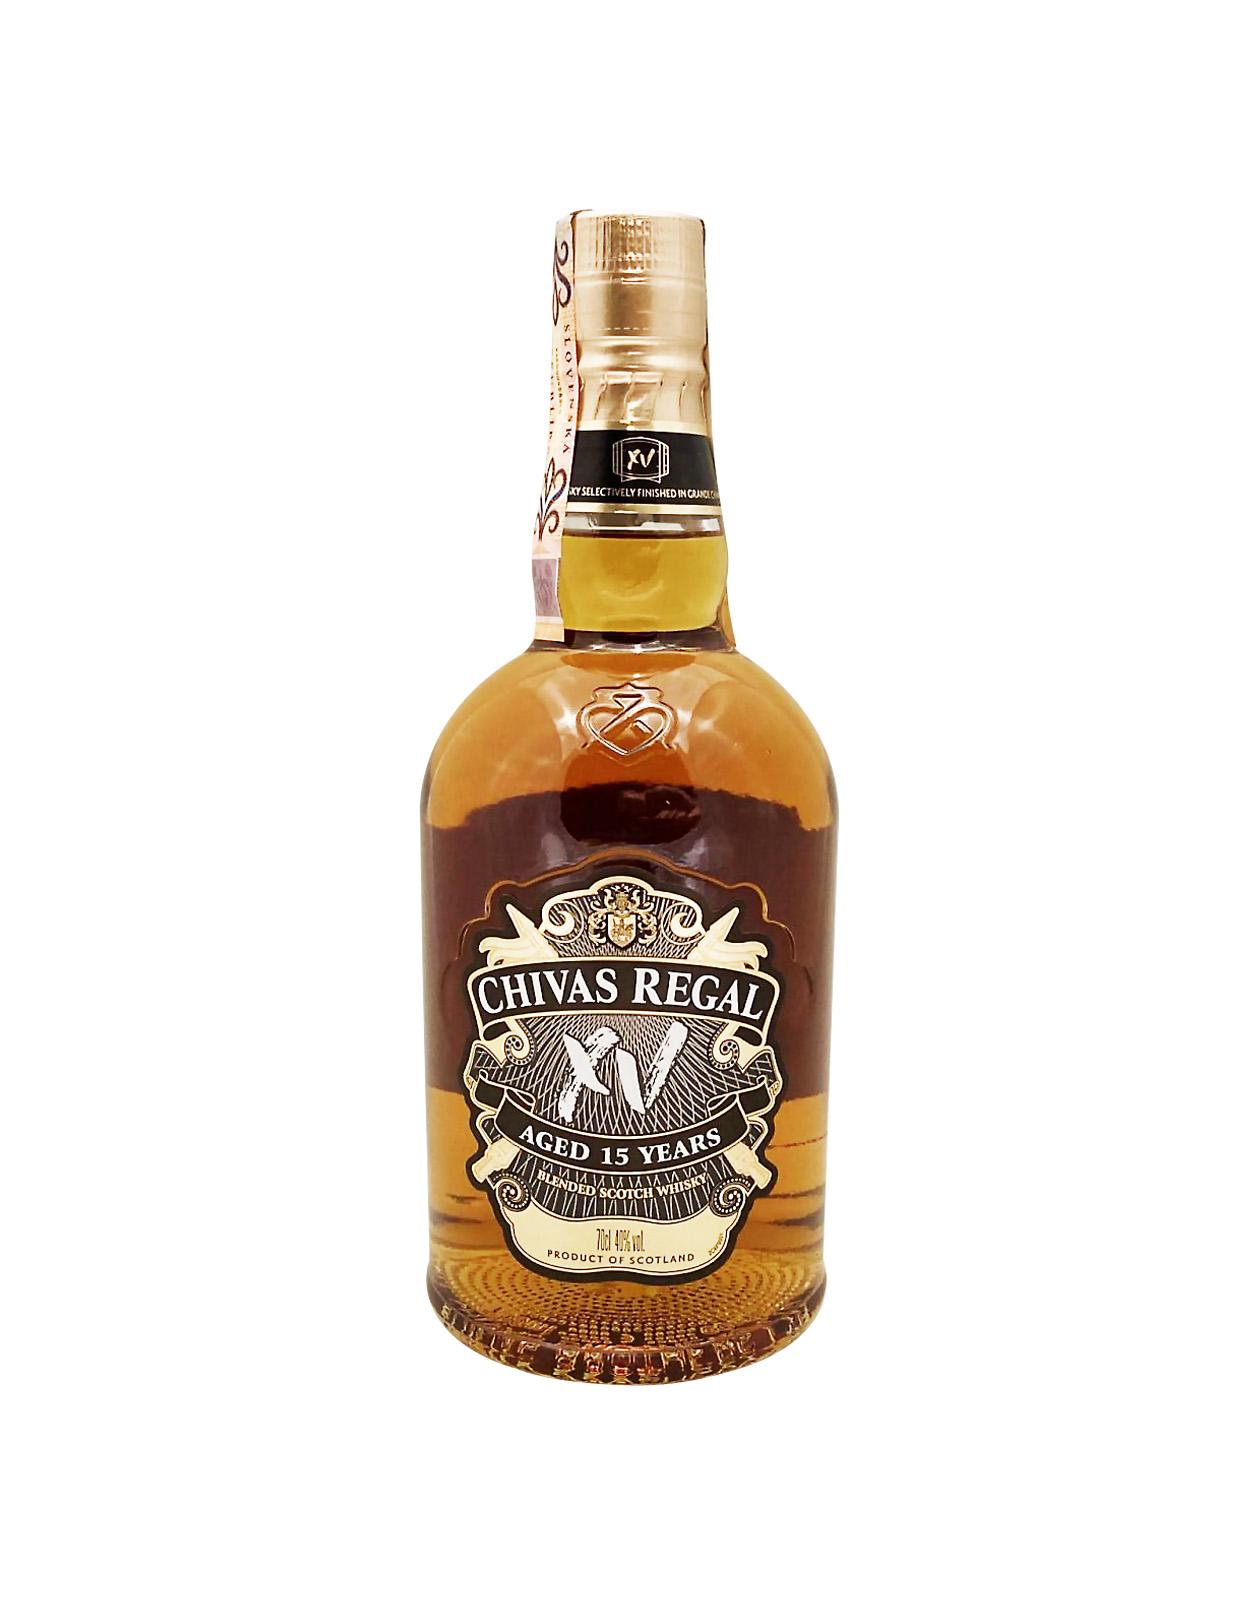 Chivas Regal XV 40%, Bottleshop Sunny wines slnecnice mesto, petrzalka, Škótska Whisky, rozvoz alkoholu, eshop